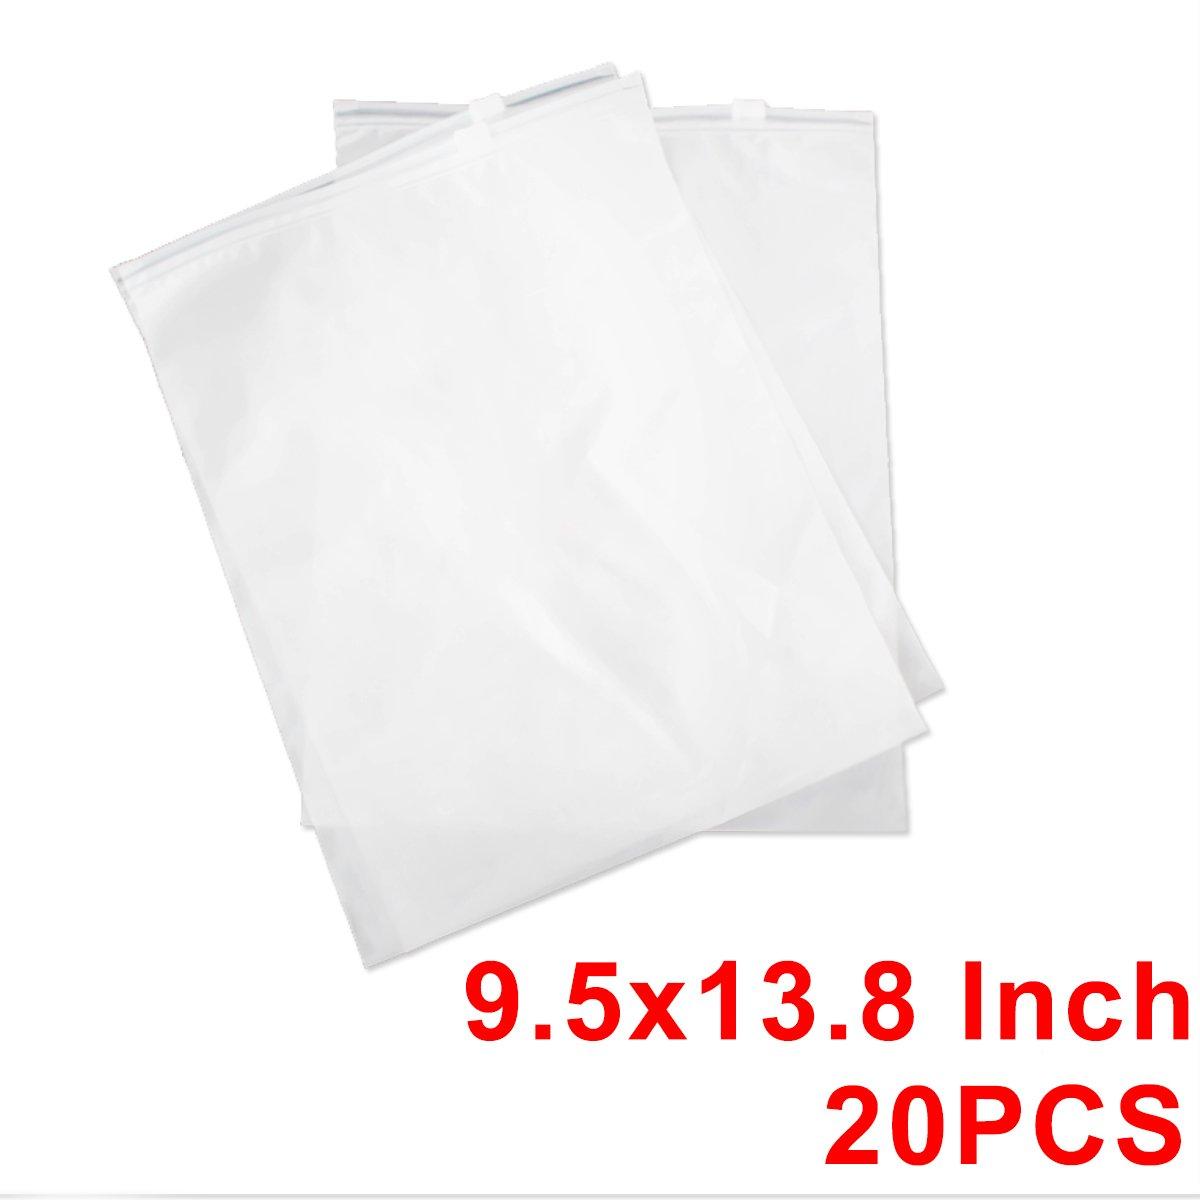 9.5x13.8 Inch 20PCS ziplock Scrub Bolsas Selladas Bolsas De Maquillaje De Viaje Transparente PVC Impermeable Bolsa De Almacenamiento De Embalaje para Ropa//Regalos//Empaquetado del Tel/éfono Celular